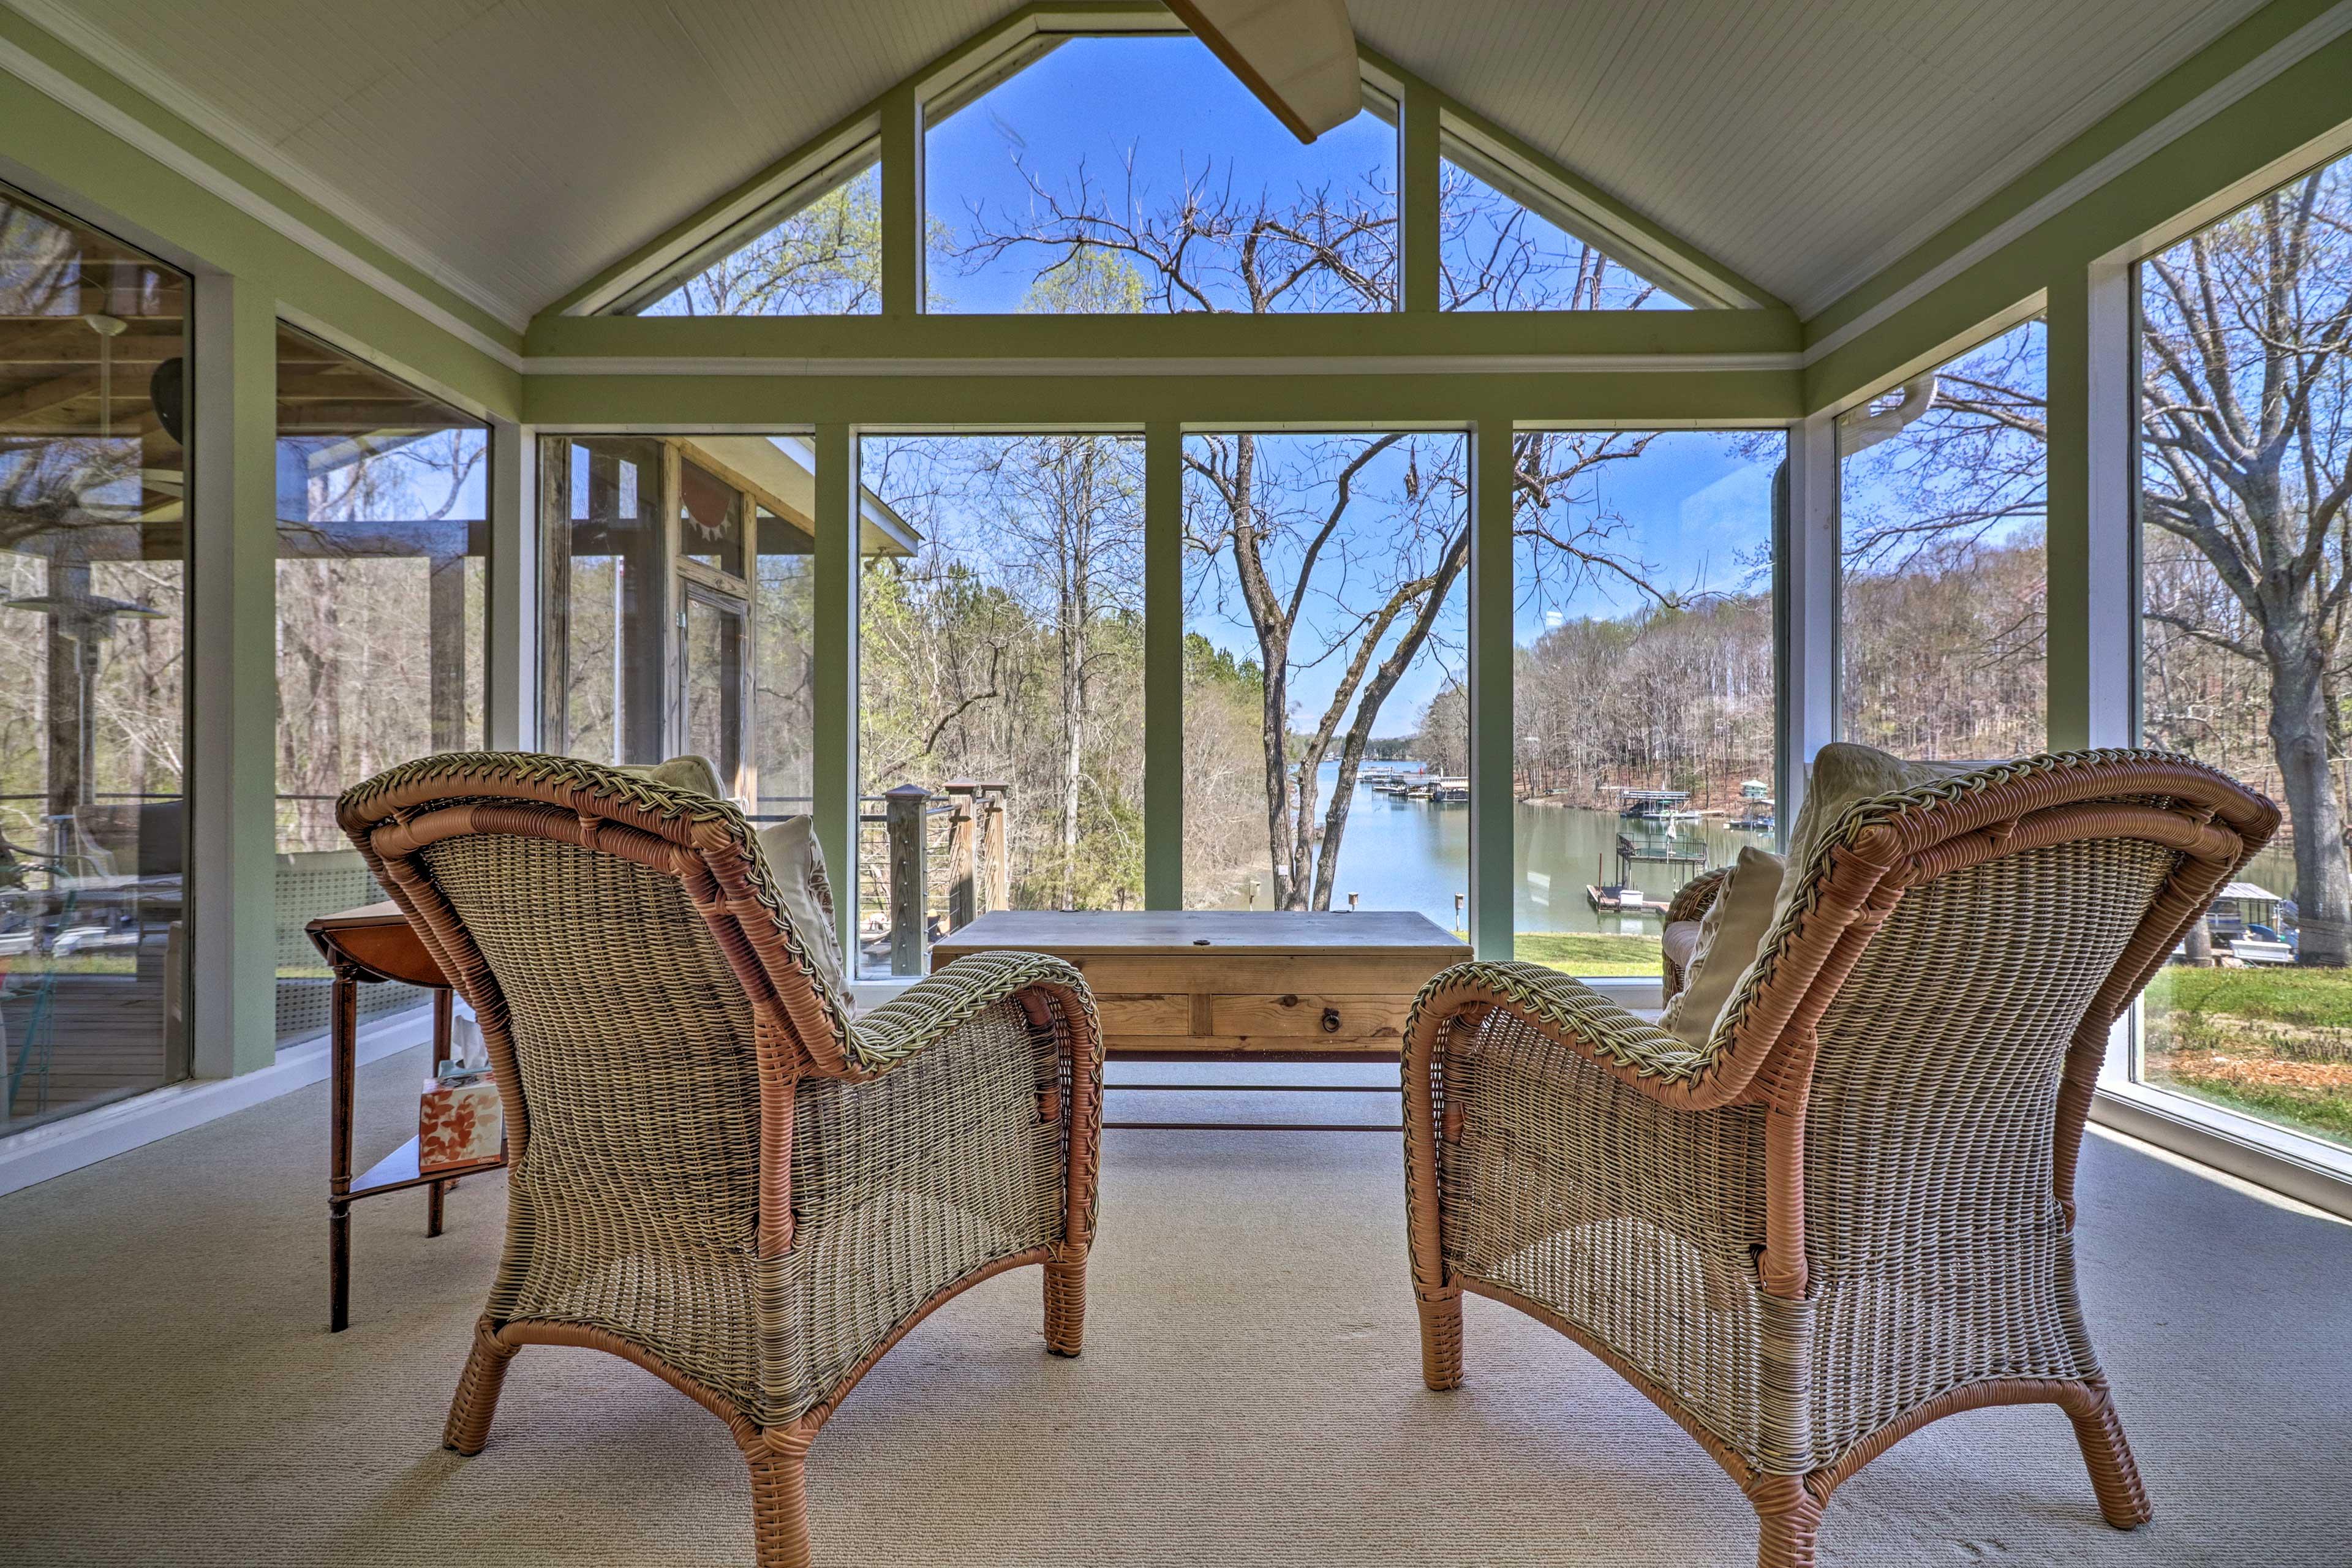 Waterfront views await at this Dawsonville vacation rental on Lake Lanier.